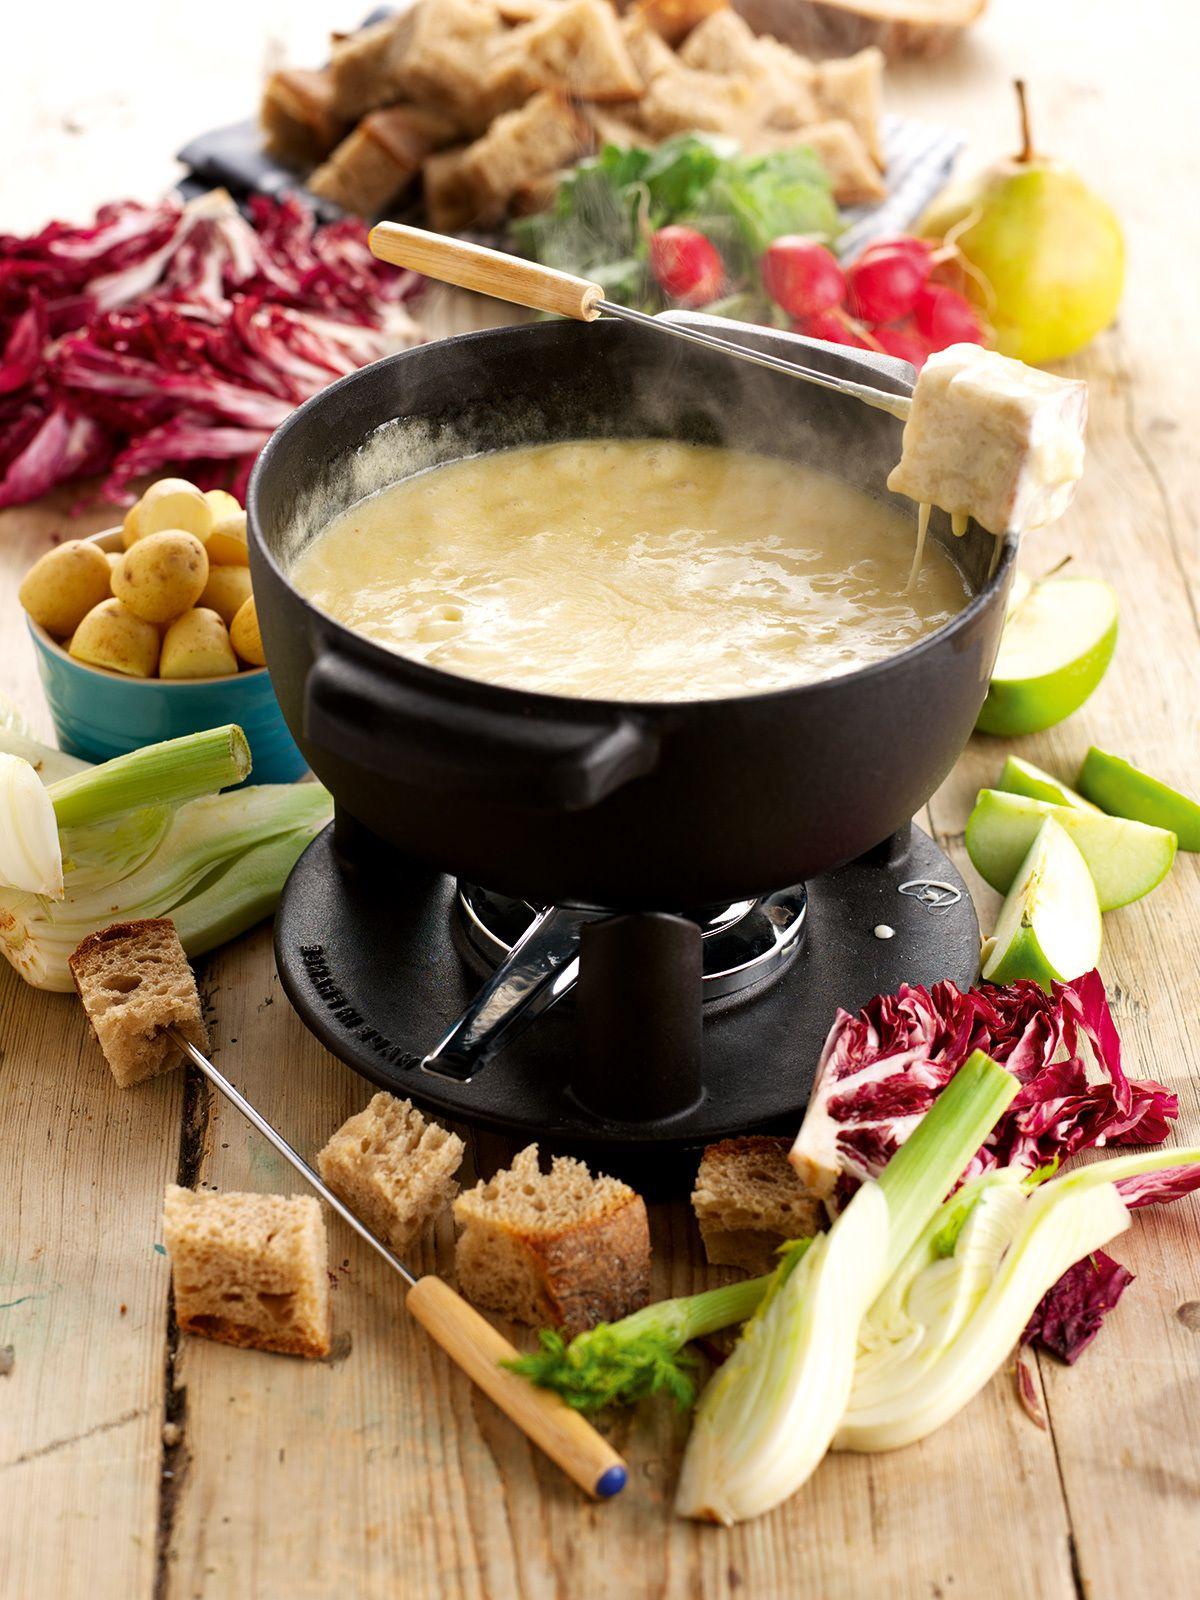 k sefondue beilagen 2 leichte rezepte f r salat als frische vegan rezepte pinterest. Black Bedroom Furniture Sets. Home Design Ideas